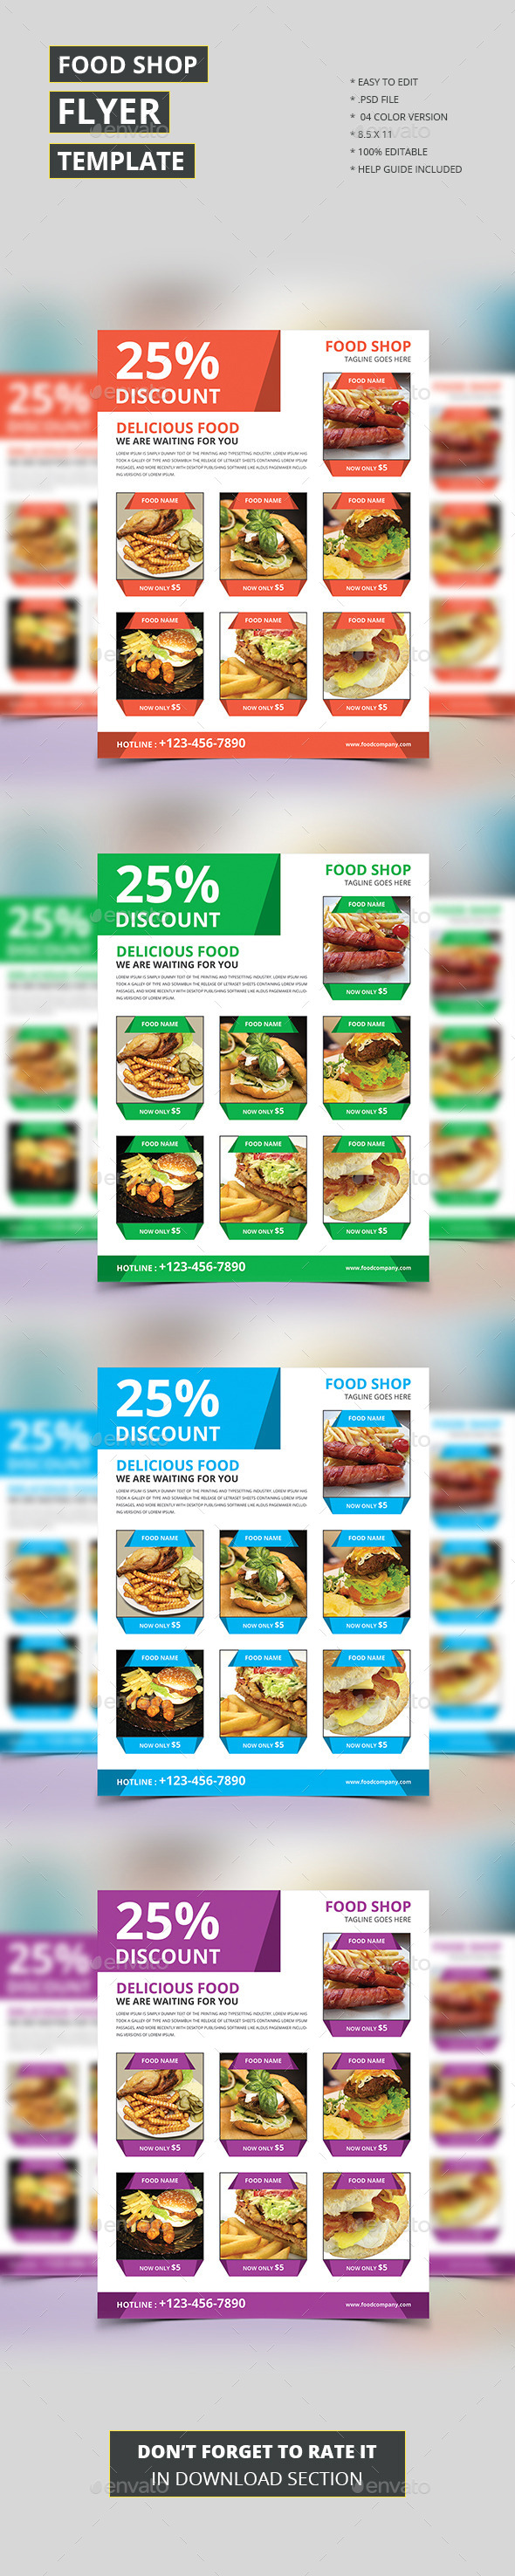 Food Shop Flyer Template